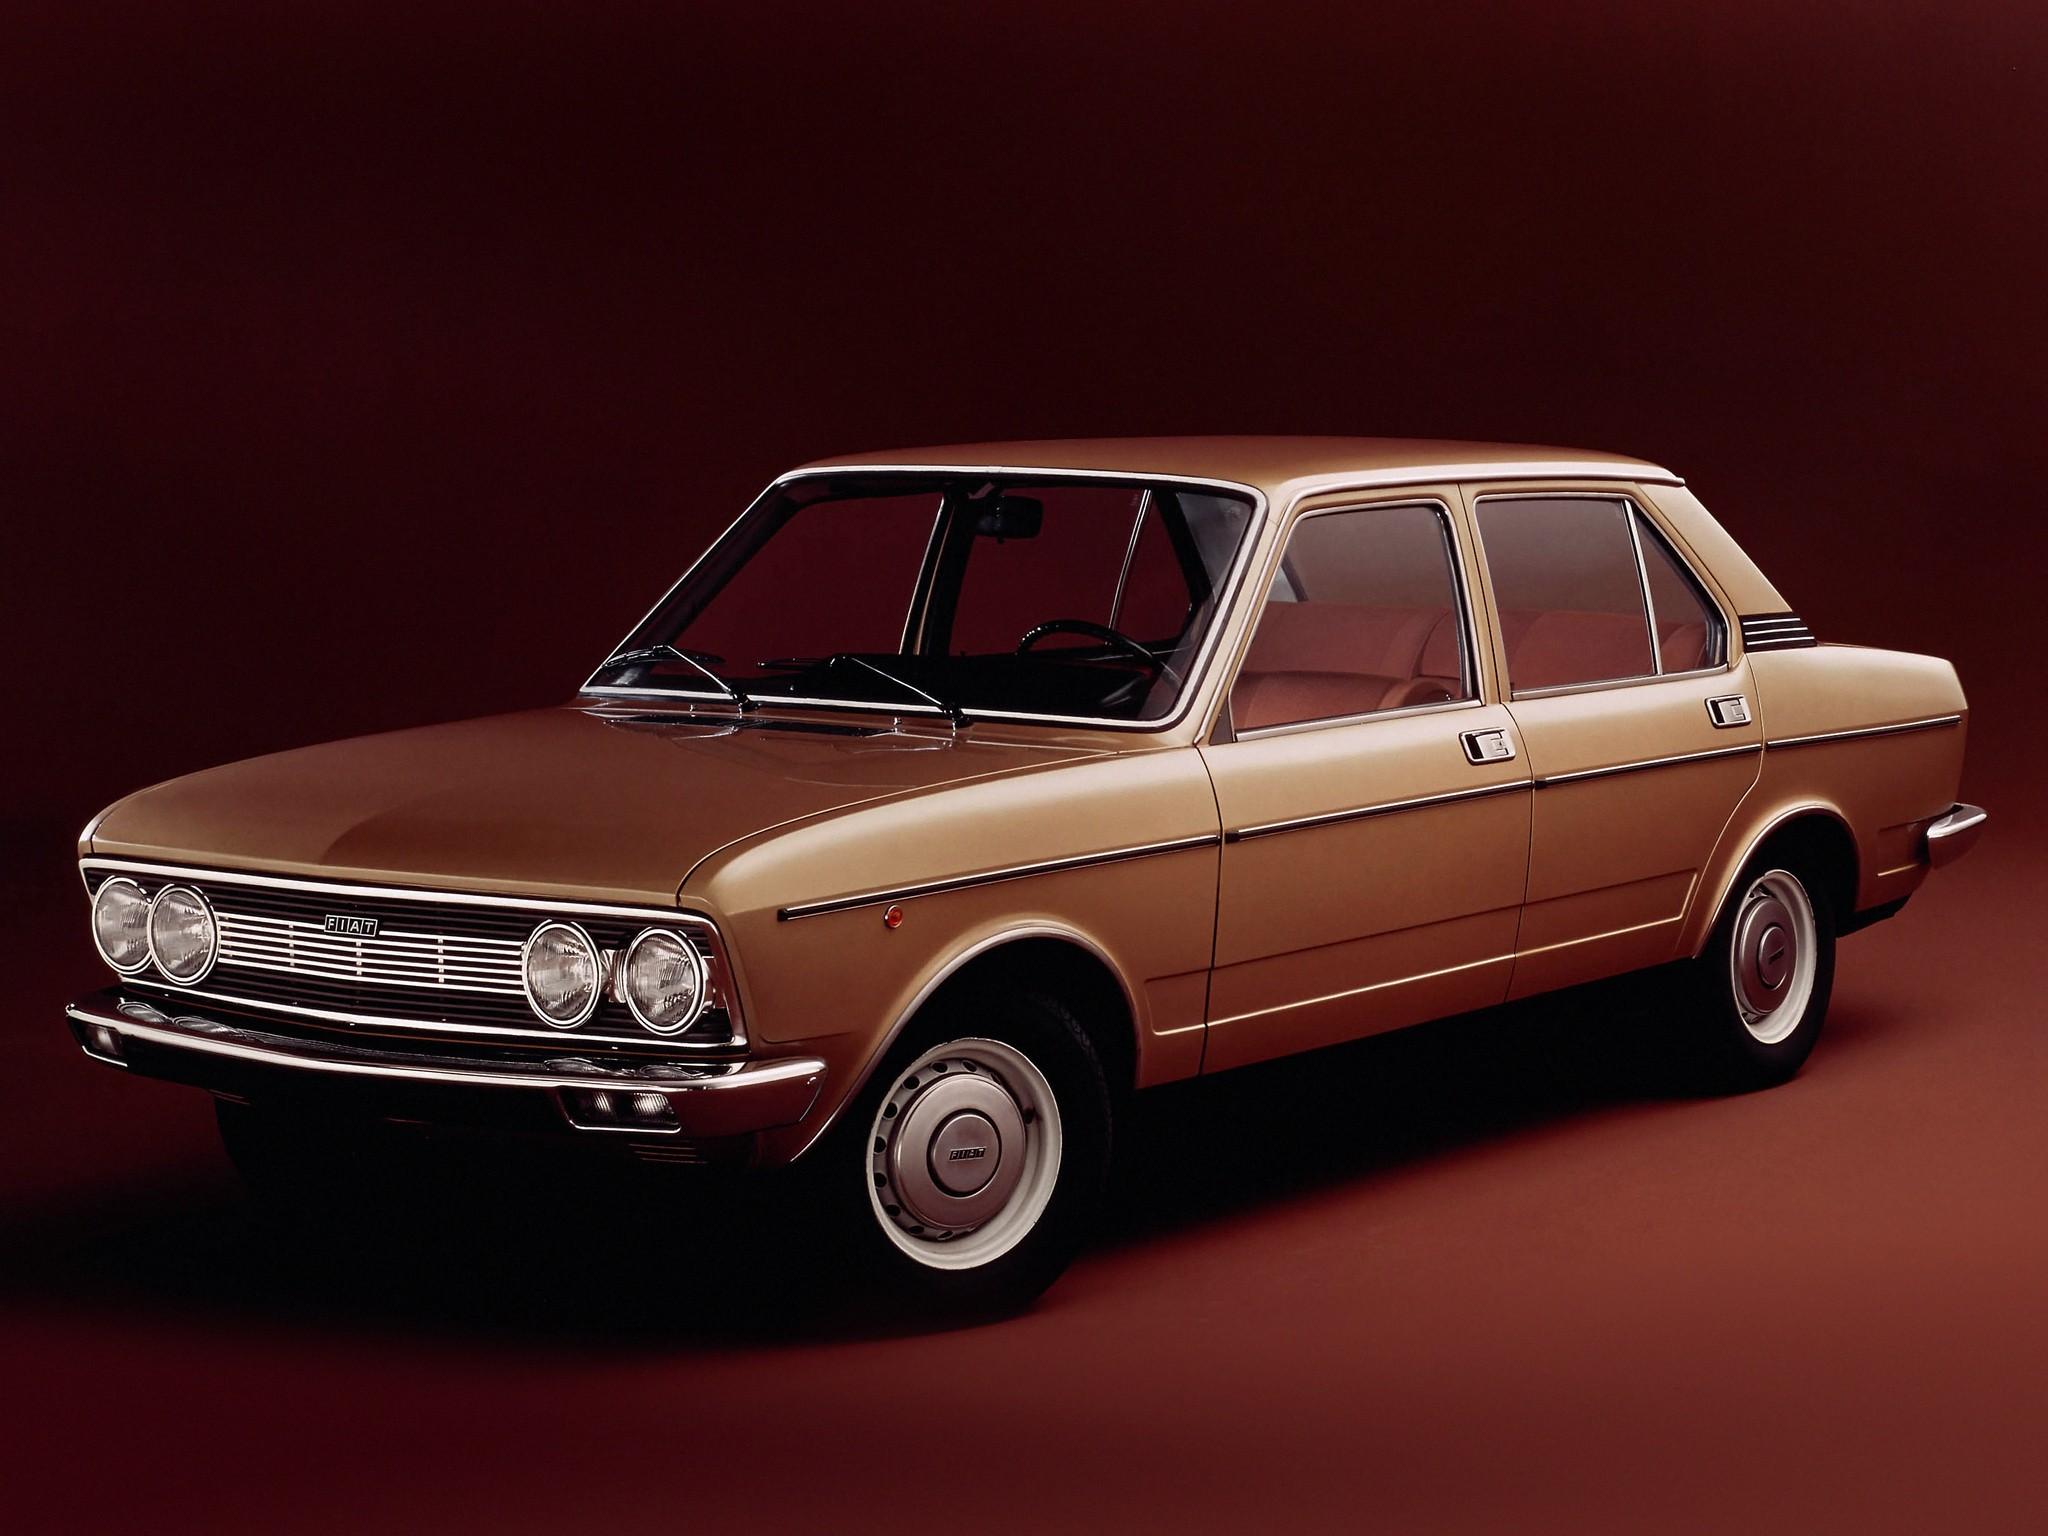 FIAT 132 specs & photos - 1972, 1973, 1974, 1975, 1976, 1977, 1978, 1979, 1980, 1981 - autoevolution